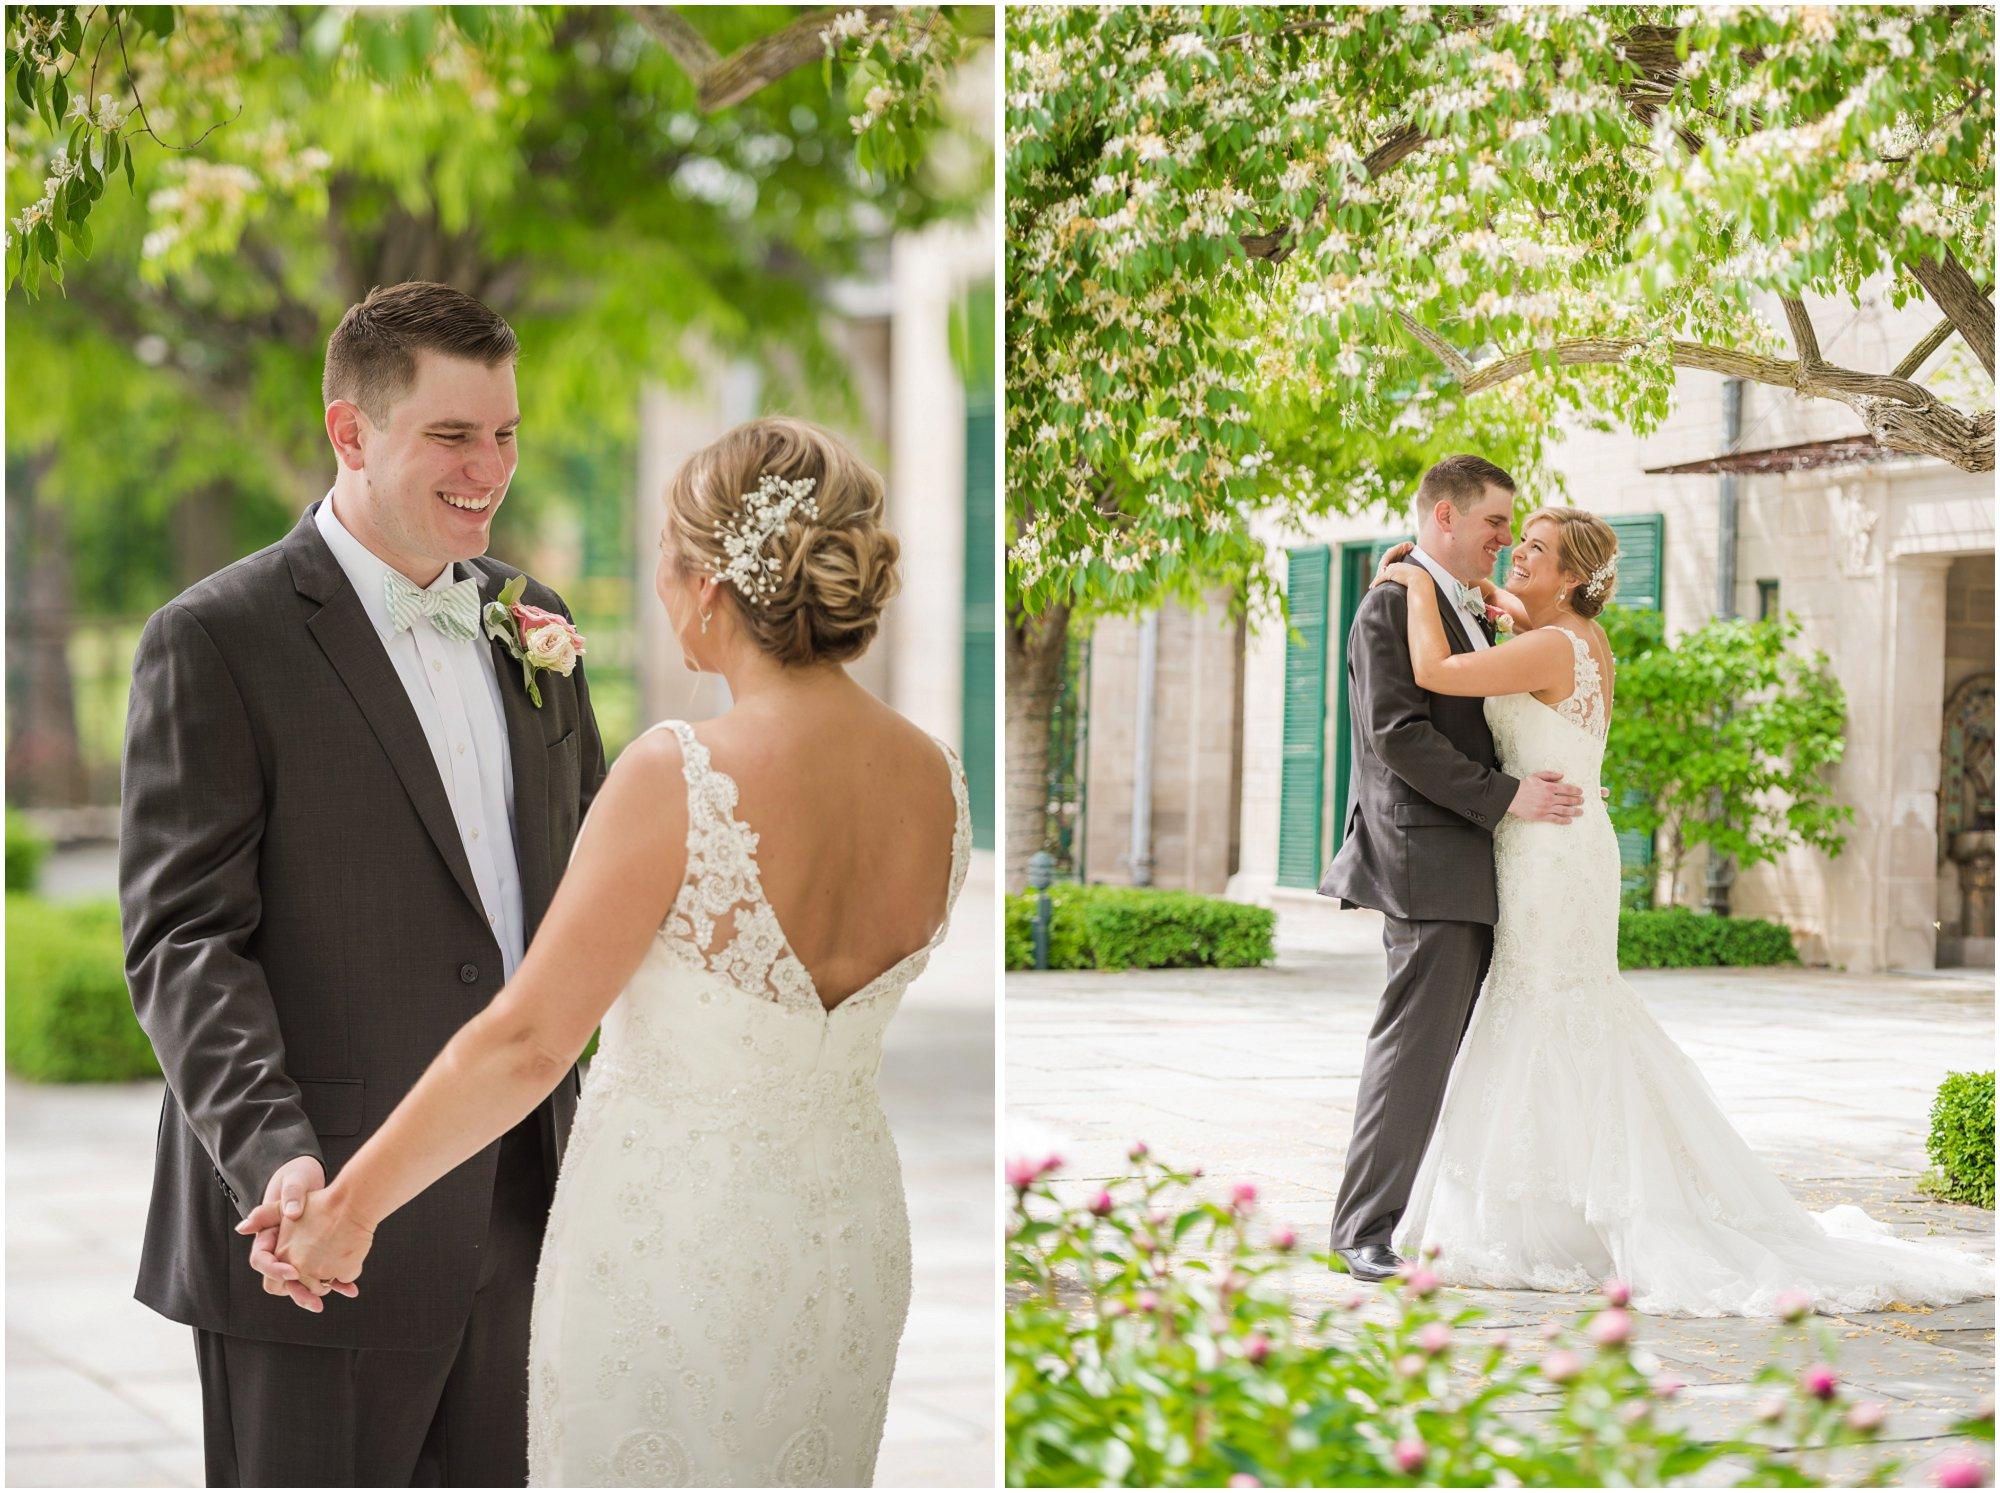 Plymouth_michigan_wedding_photographer_0406.jpg